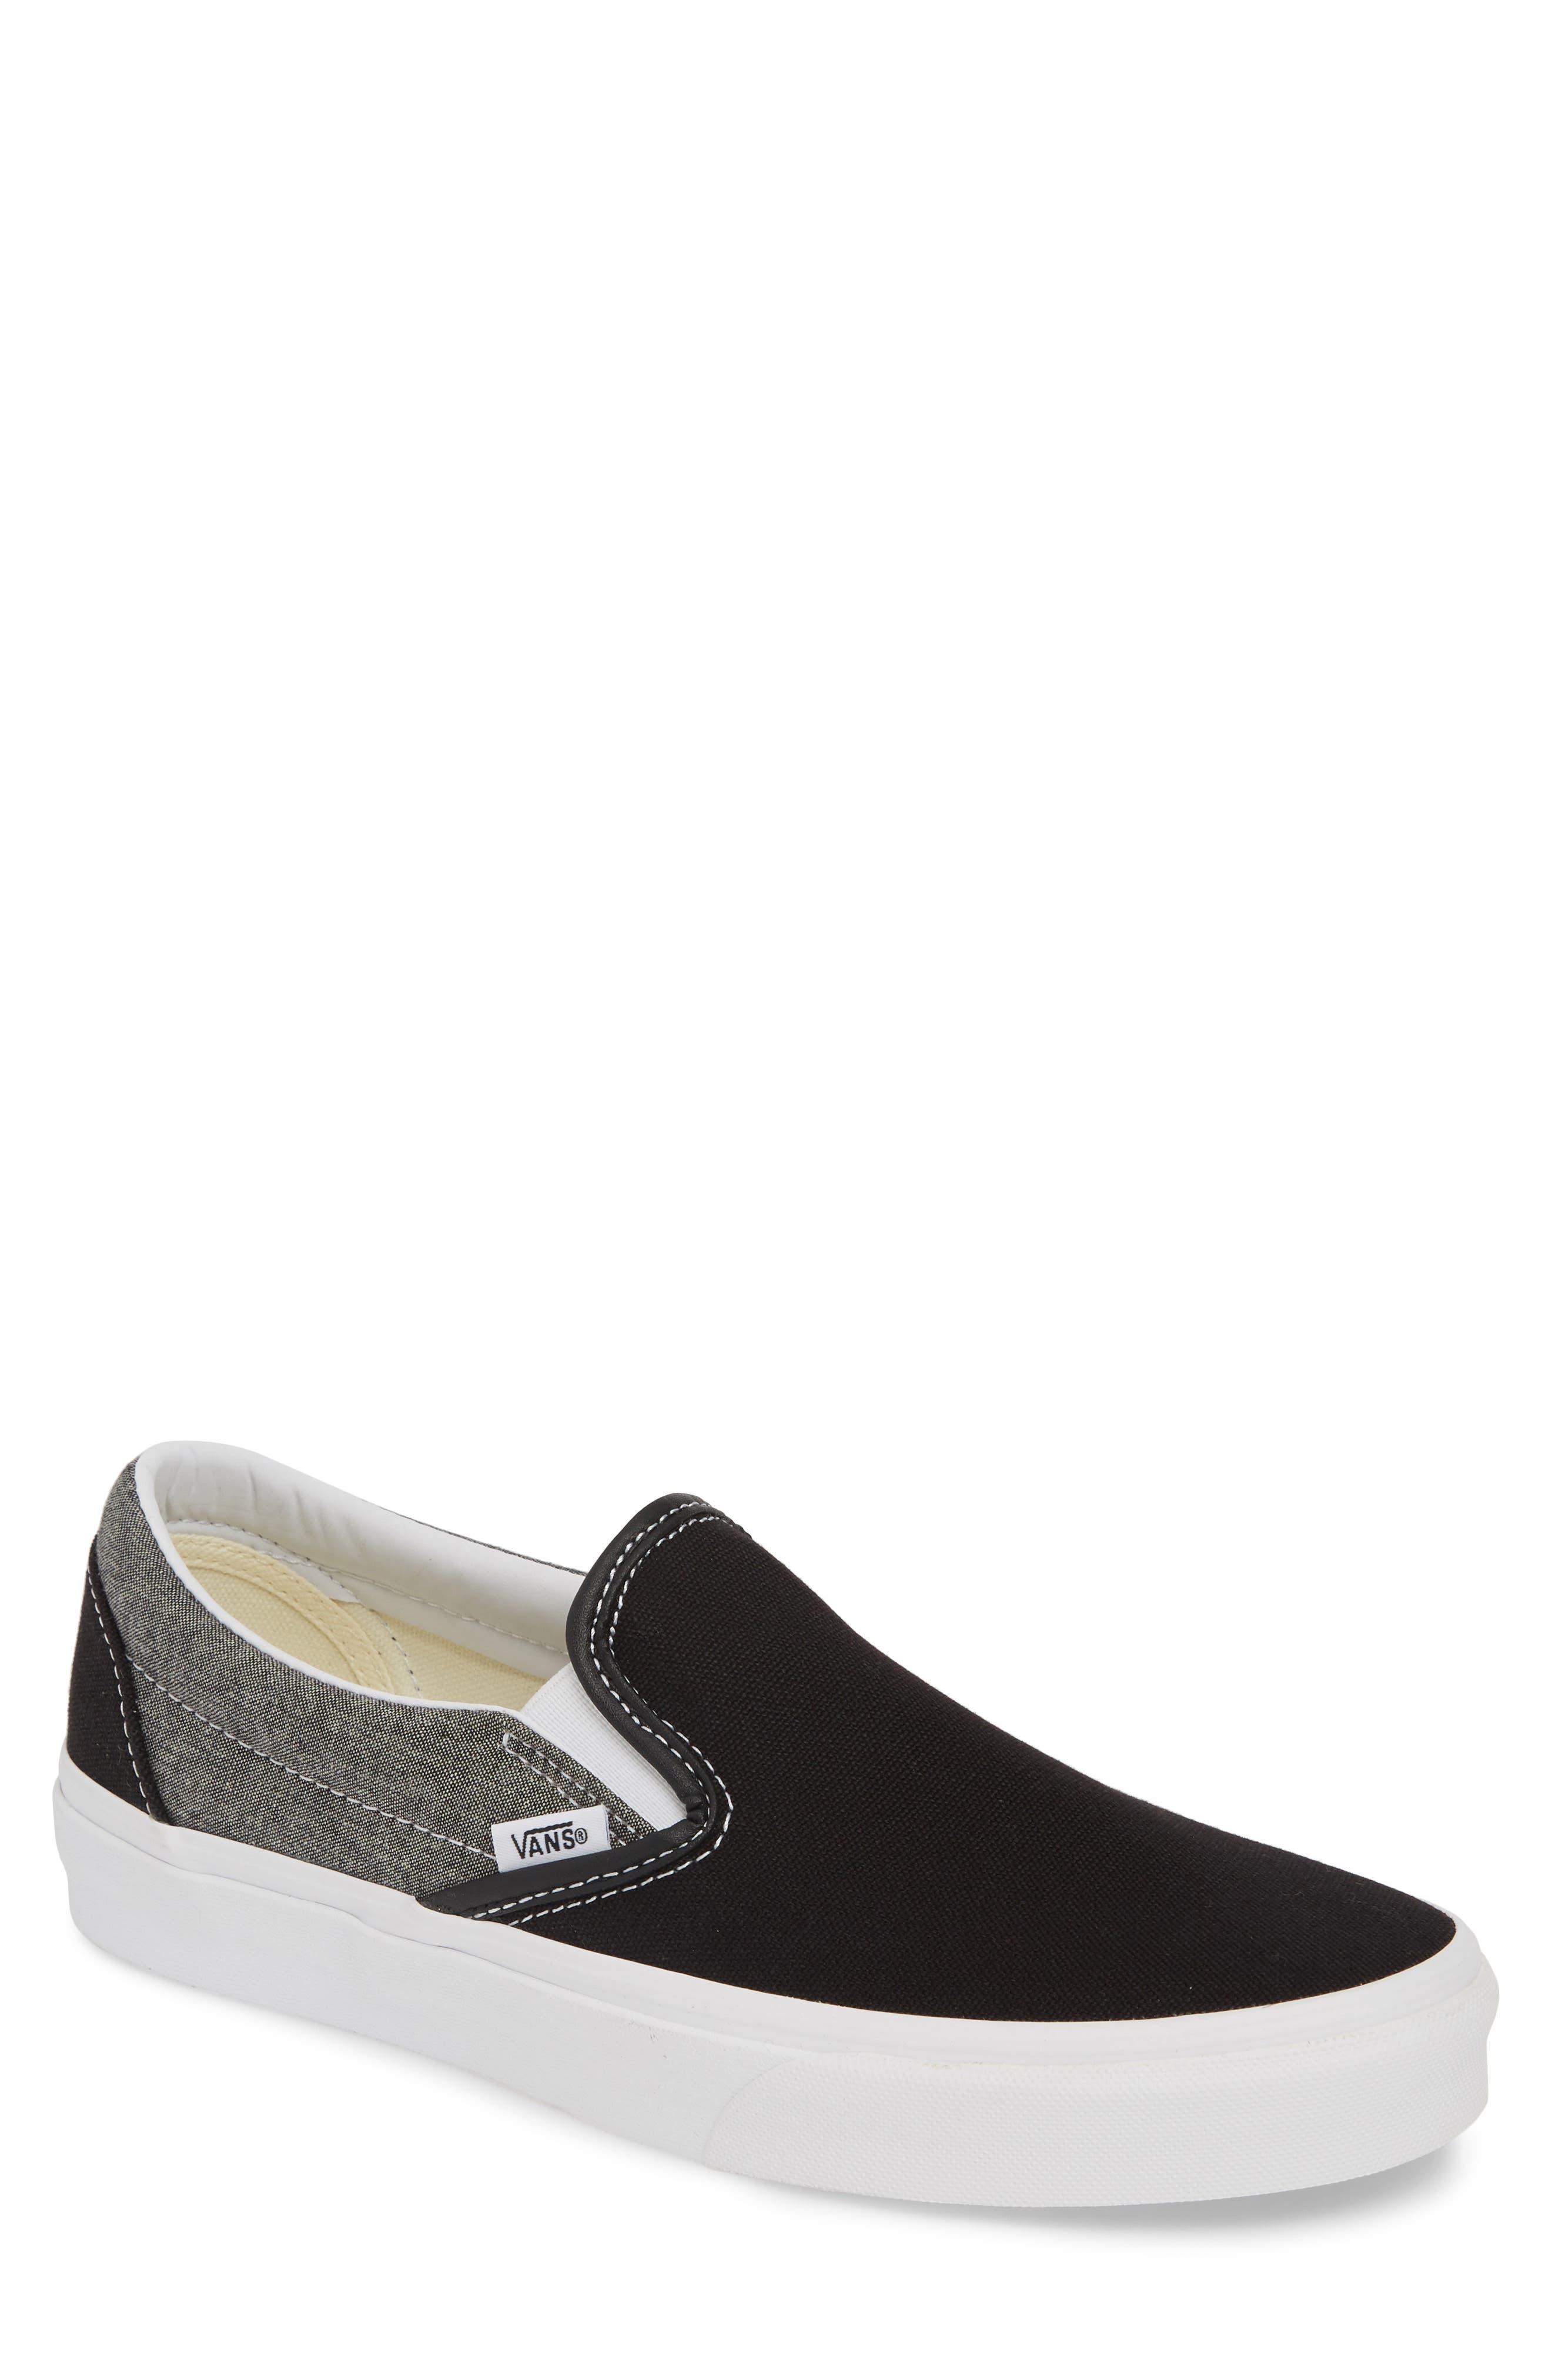 VANS, 'Classic' Slip-On Sneaker, Main thumbnail 1, color, CANVAS BLACK/ WHITE CHAMBRAY